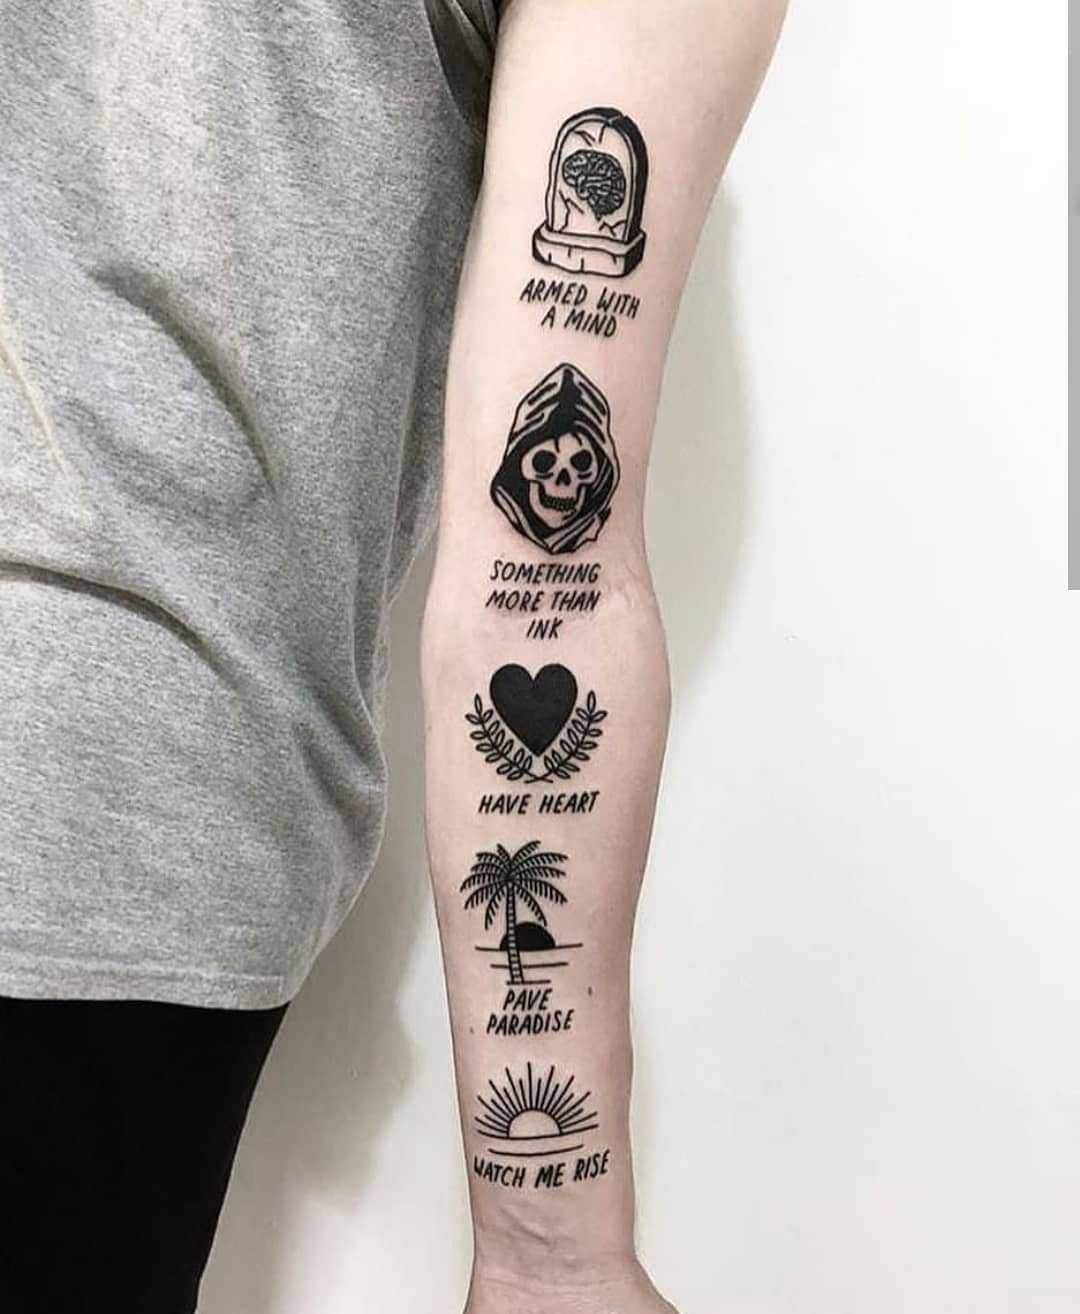 Various black tattoos on the left arm